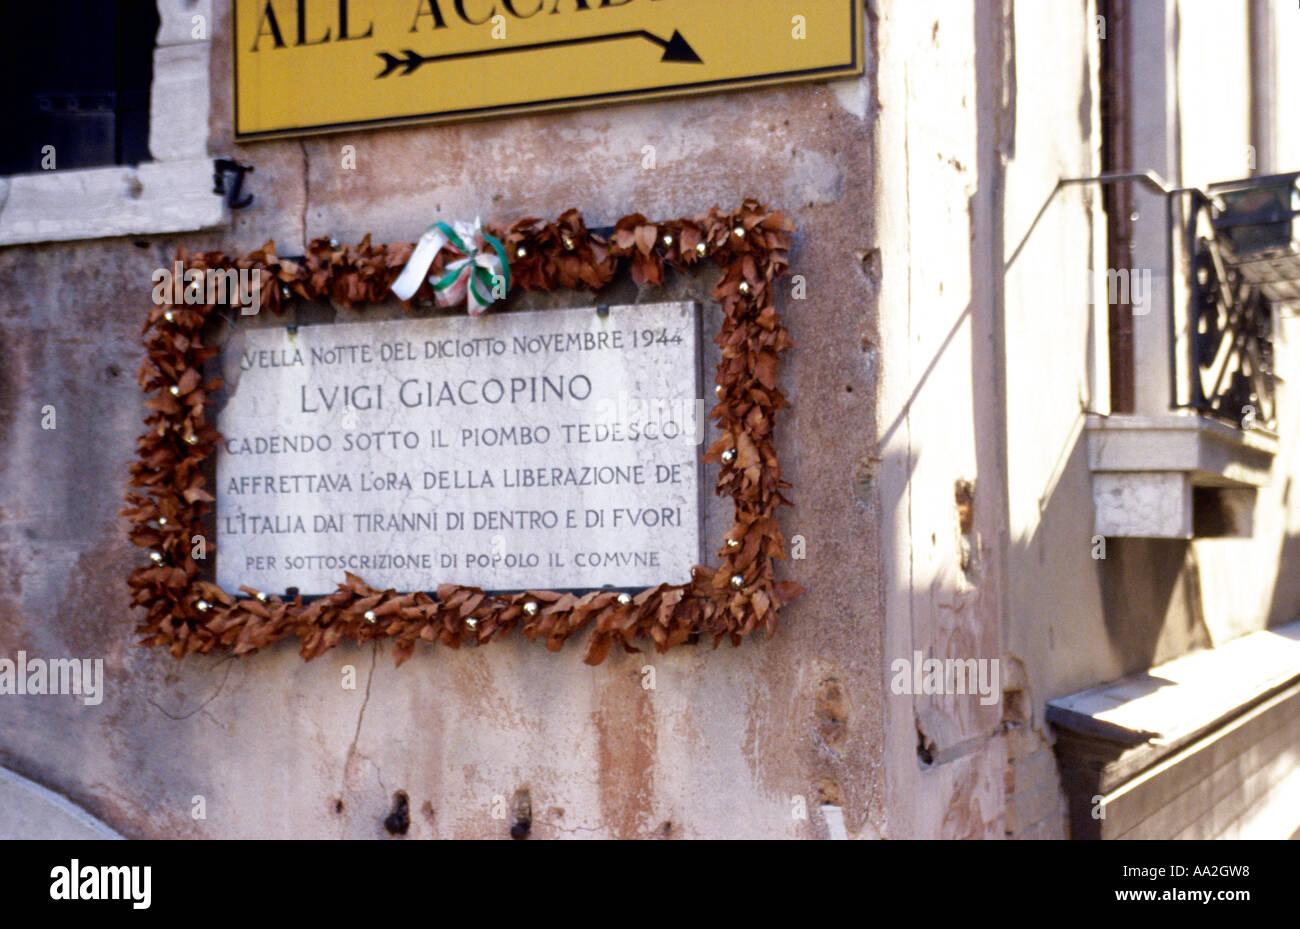 Italy, Venice, San Marco, commemorative marble plaque with decorative surround Stock Photo